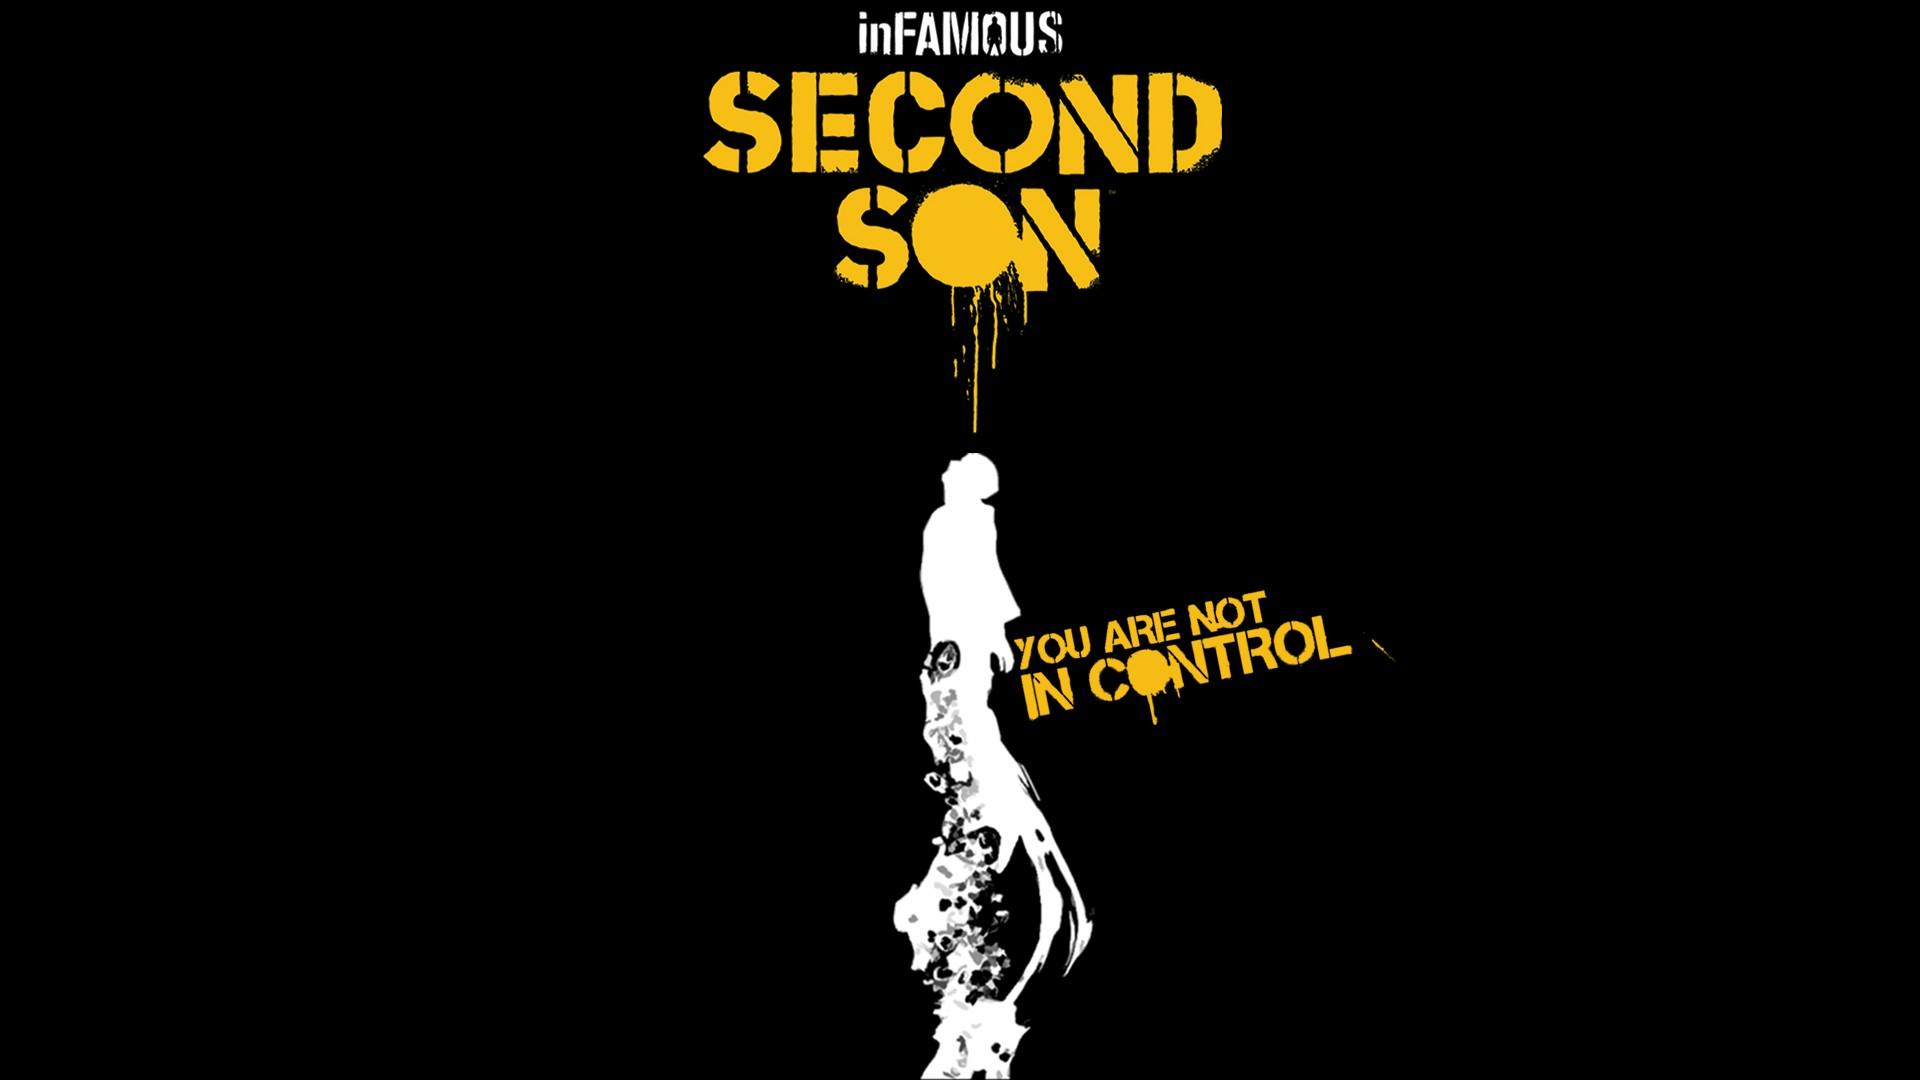 Infamous Second Son Logo Wallpaper